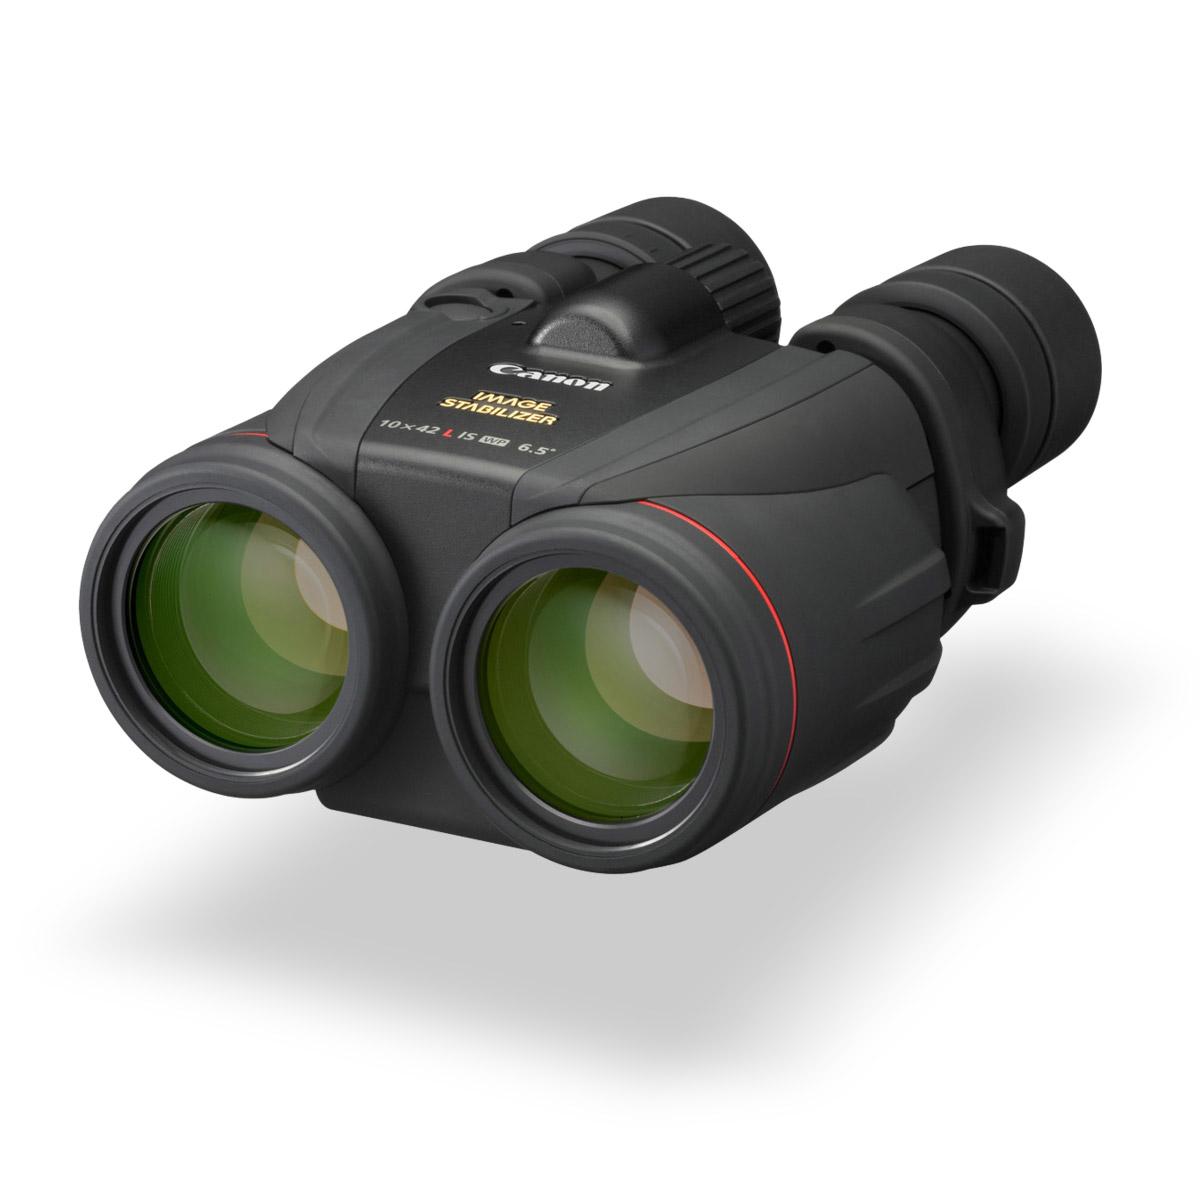 Canon 10 x 42L IS WP binoculars